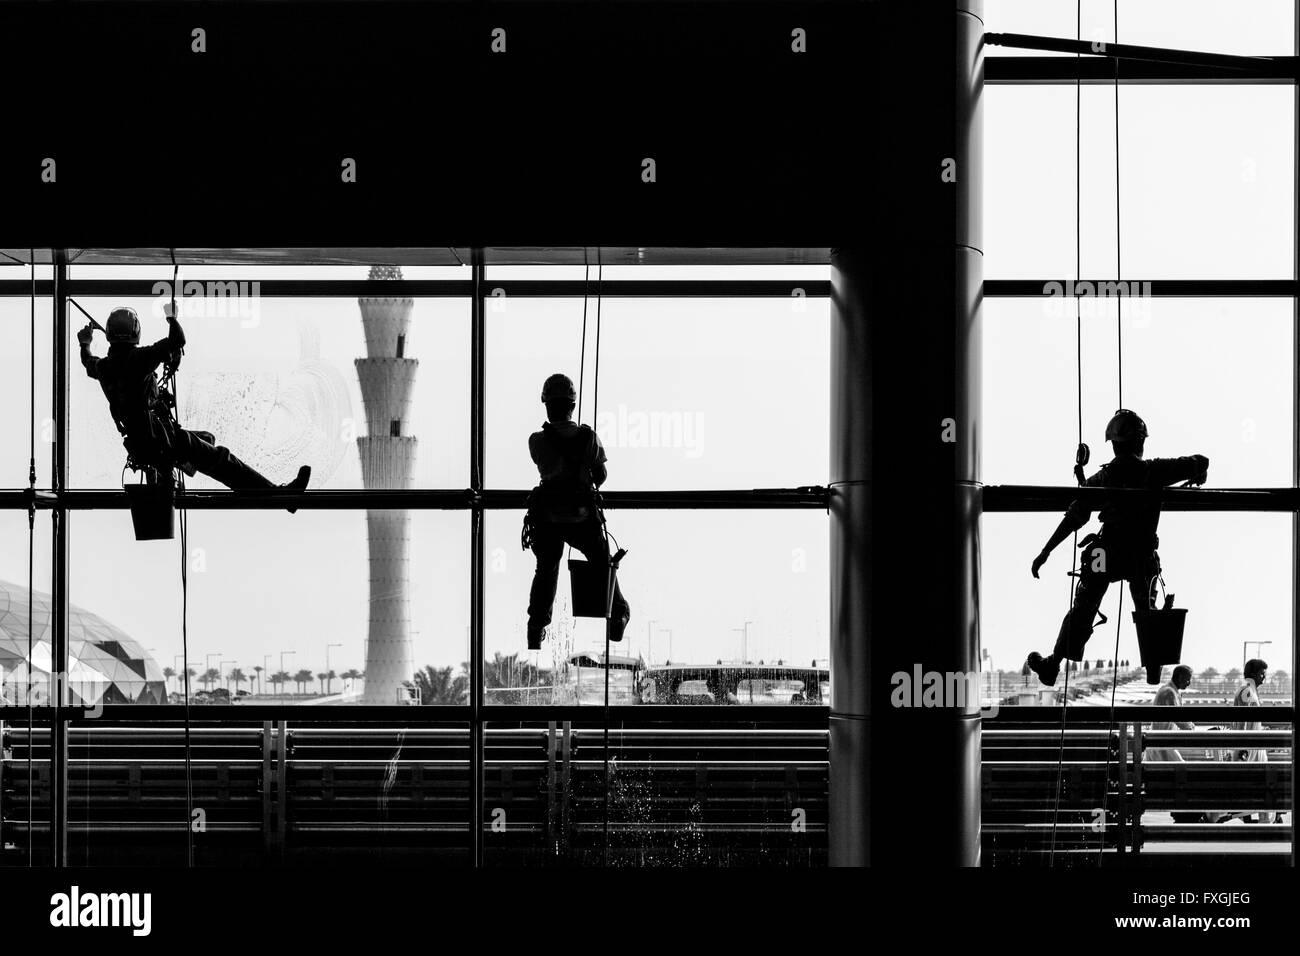 Nettoyage de vitres, de l'Aéroport International Hamad, Doha, Qatar Banque D'Images